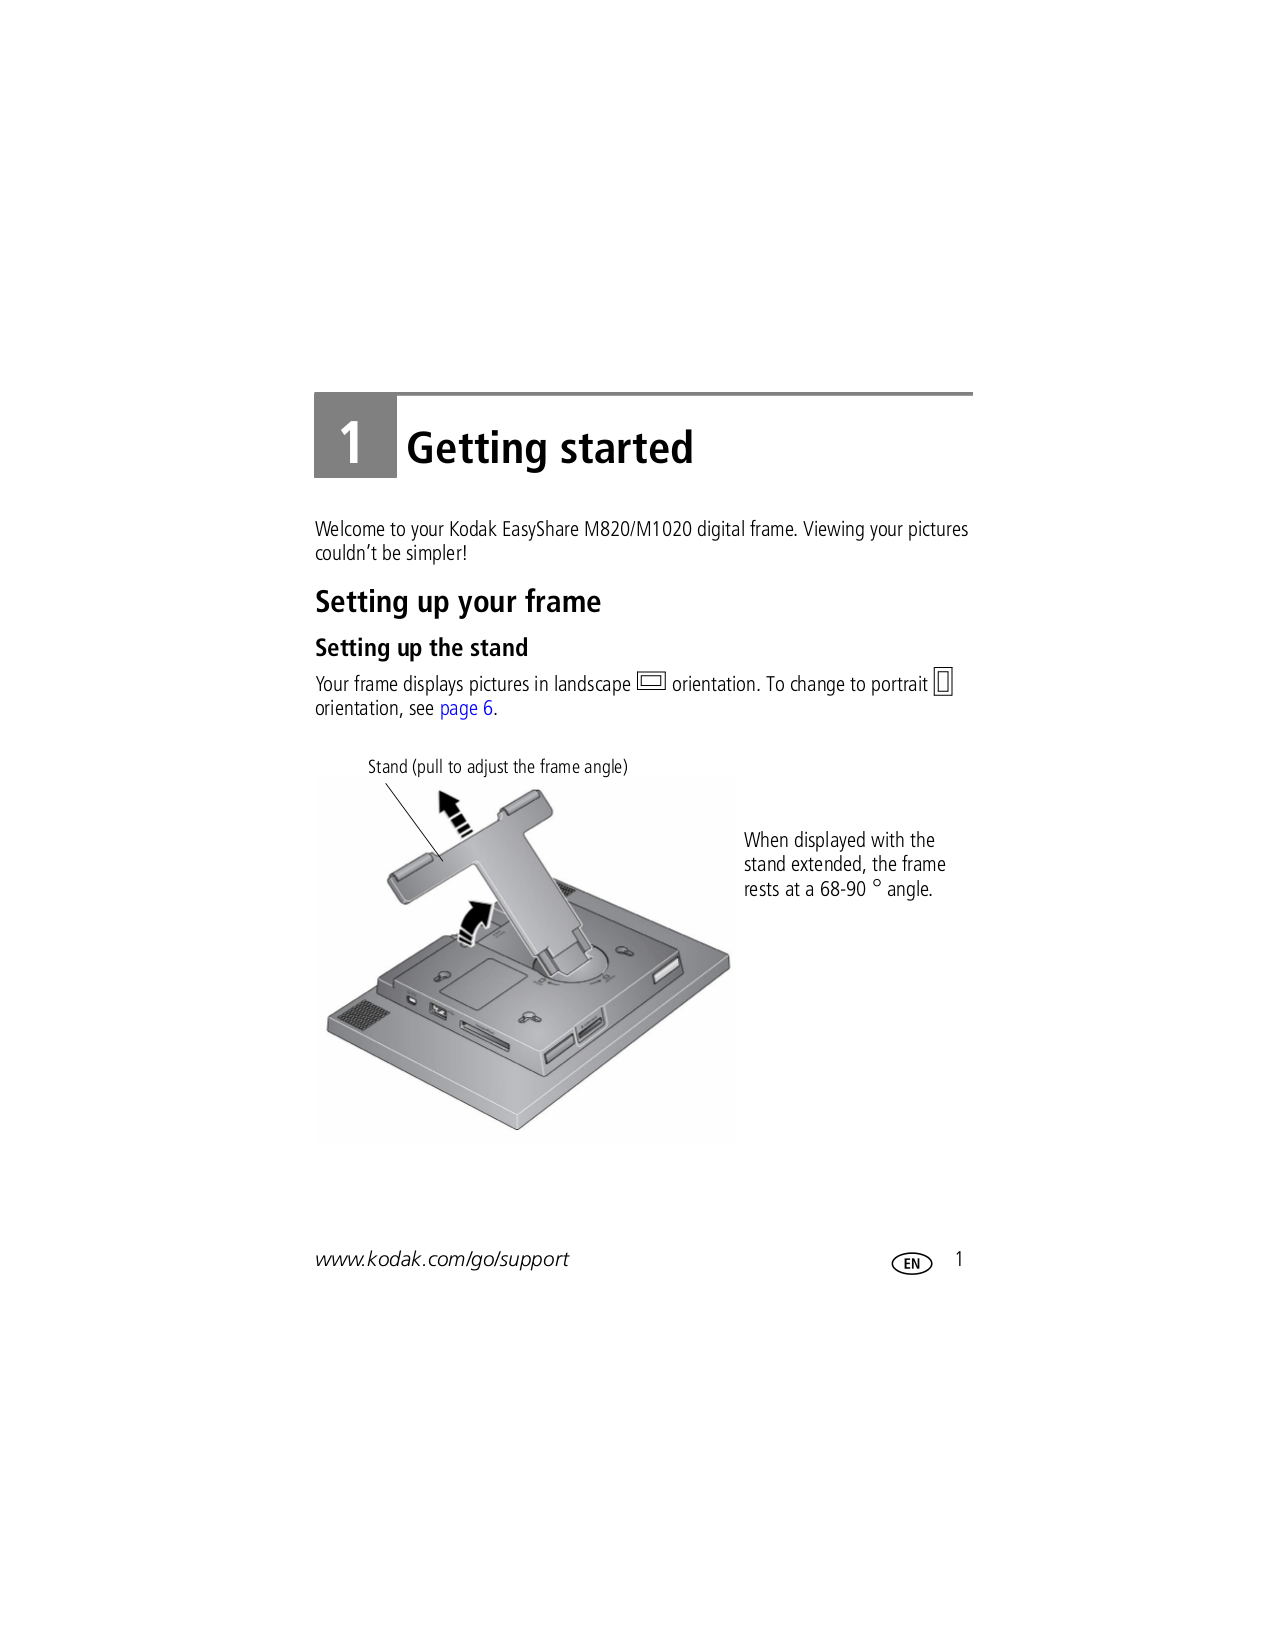 PDF manual for Kodak Digital Photo Frame EasyShare M1020